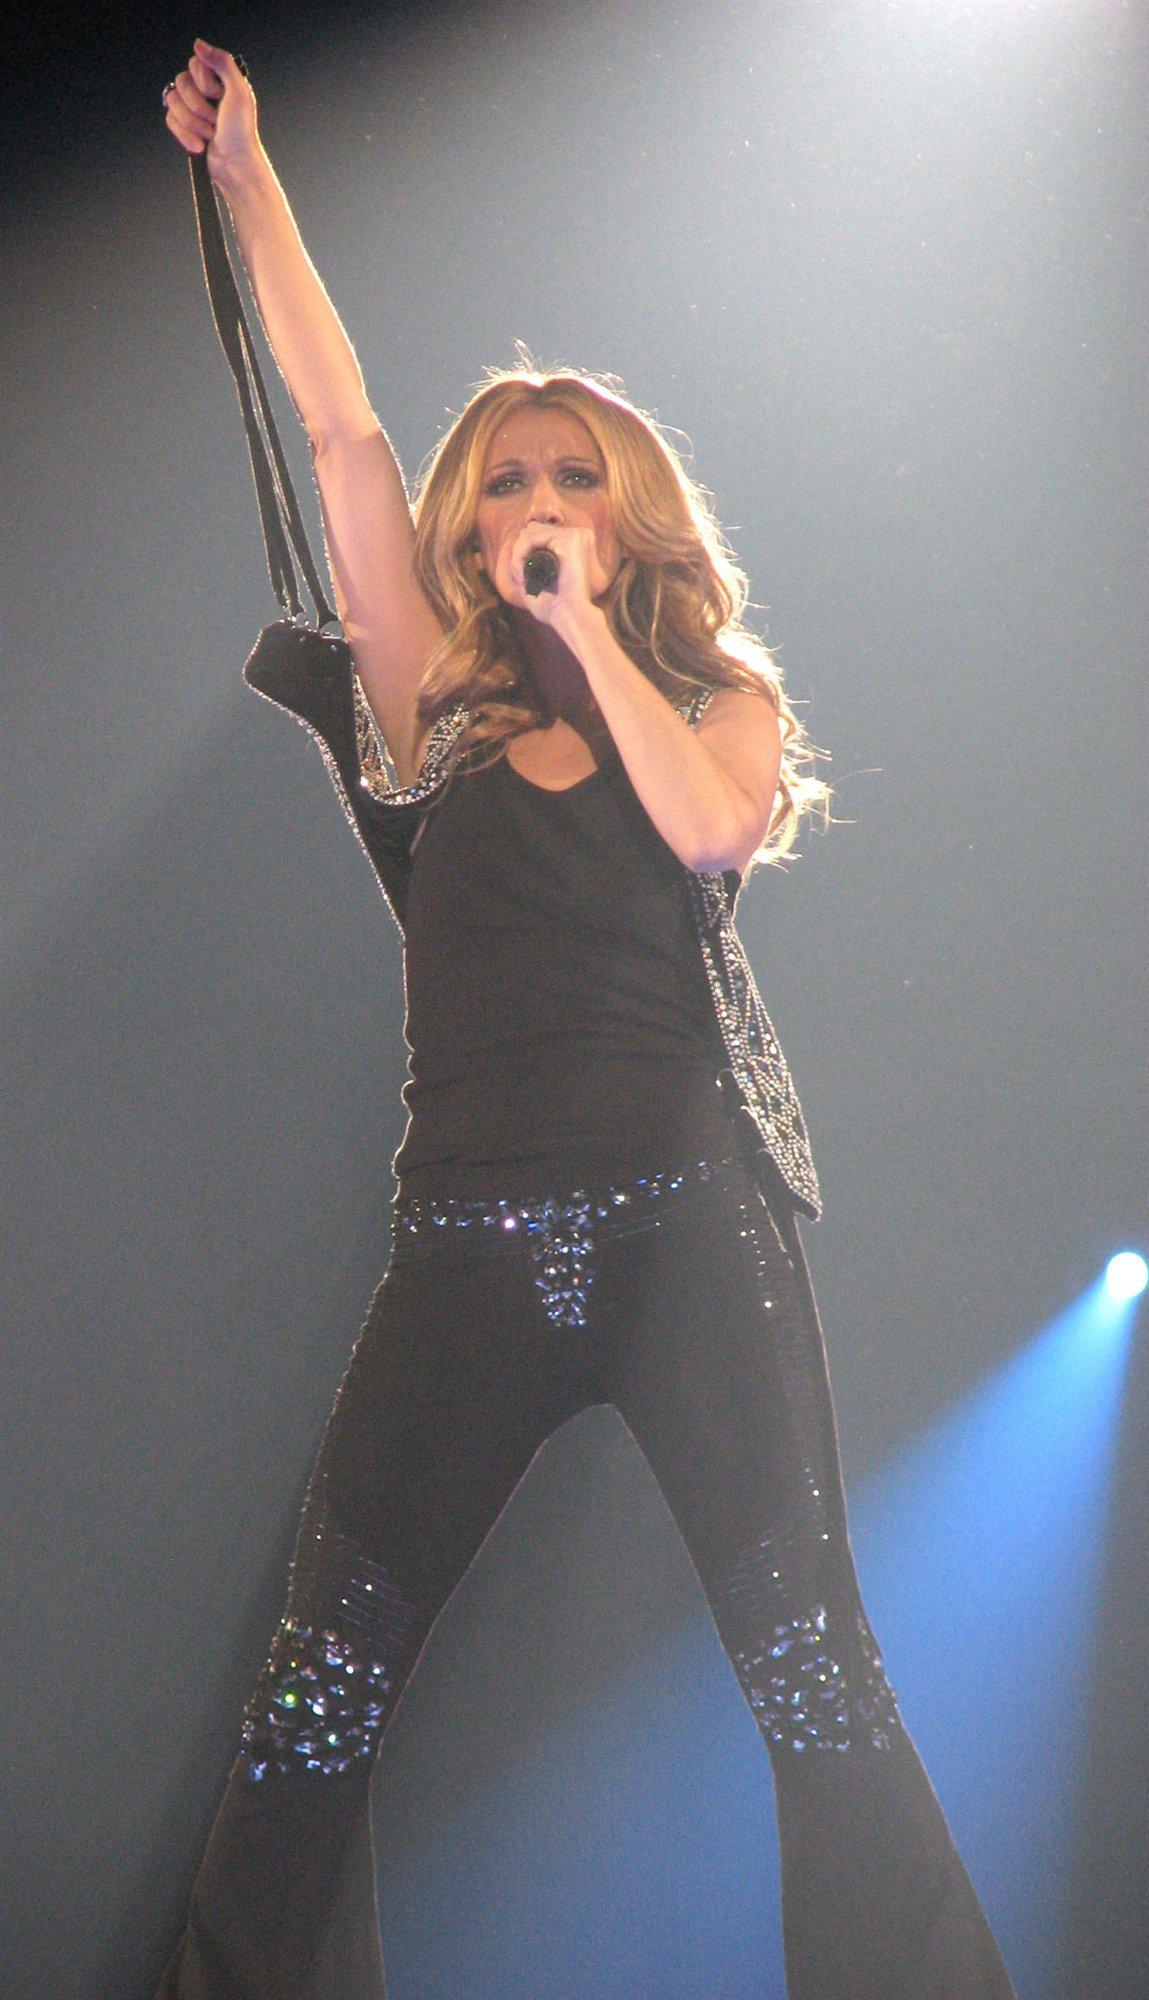 Celine Dion leaked wallpapers